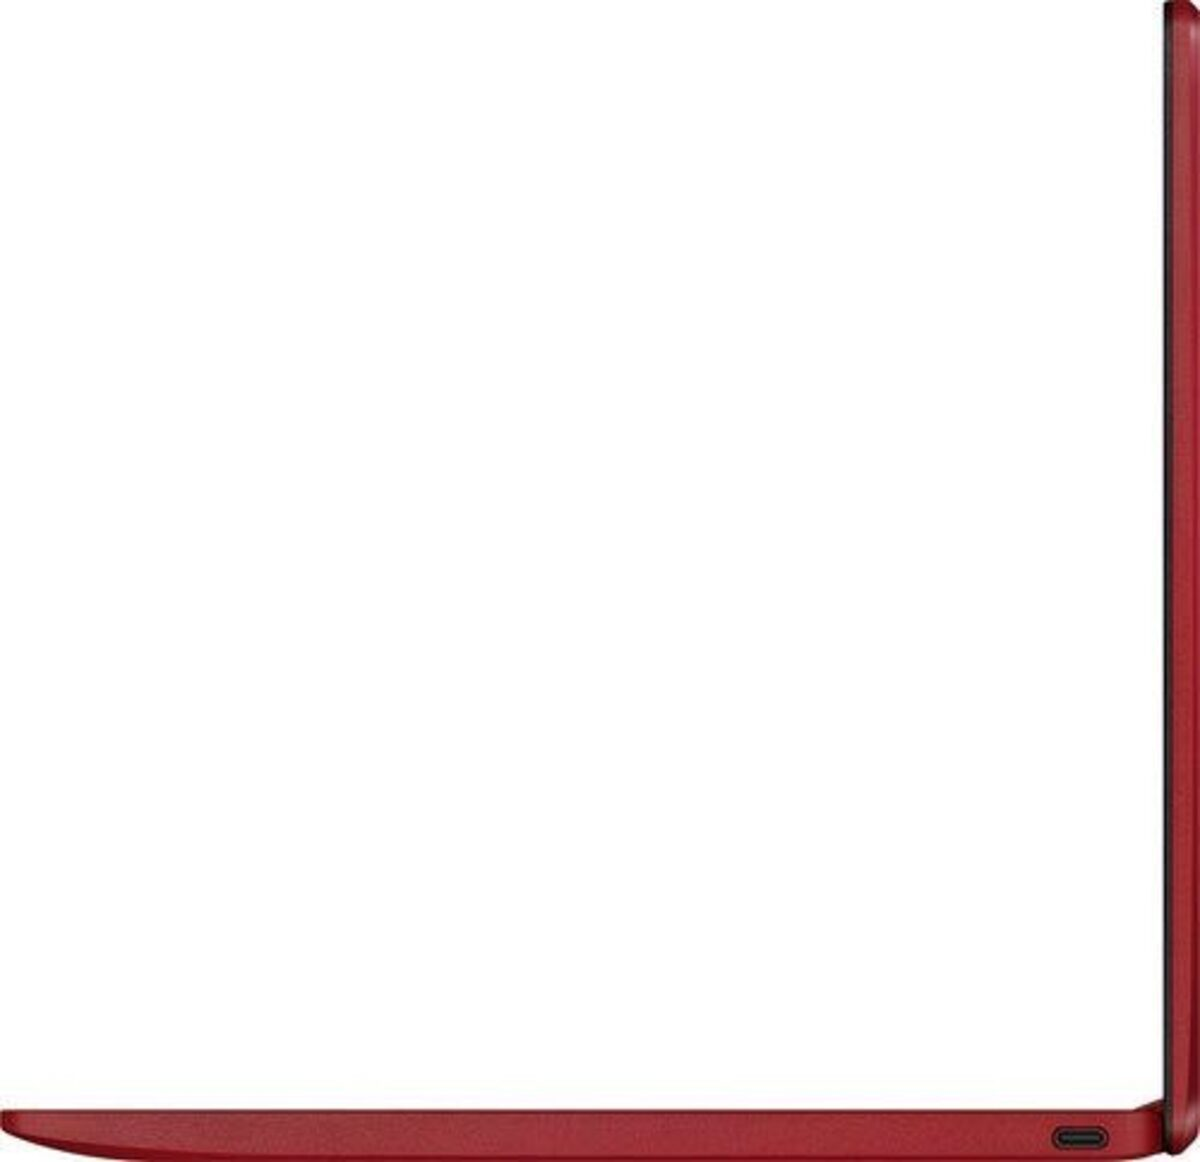 Bild 3 von Asus C223NA-GJ0077 Chromebook (29,46 cm/11,6 Zoll, Intel Celeron, HD Graphics 500)